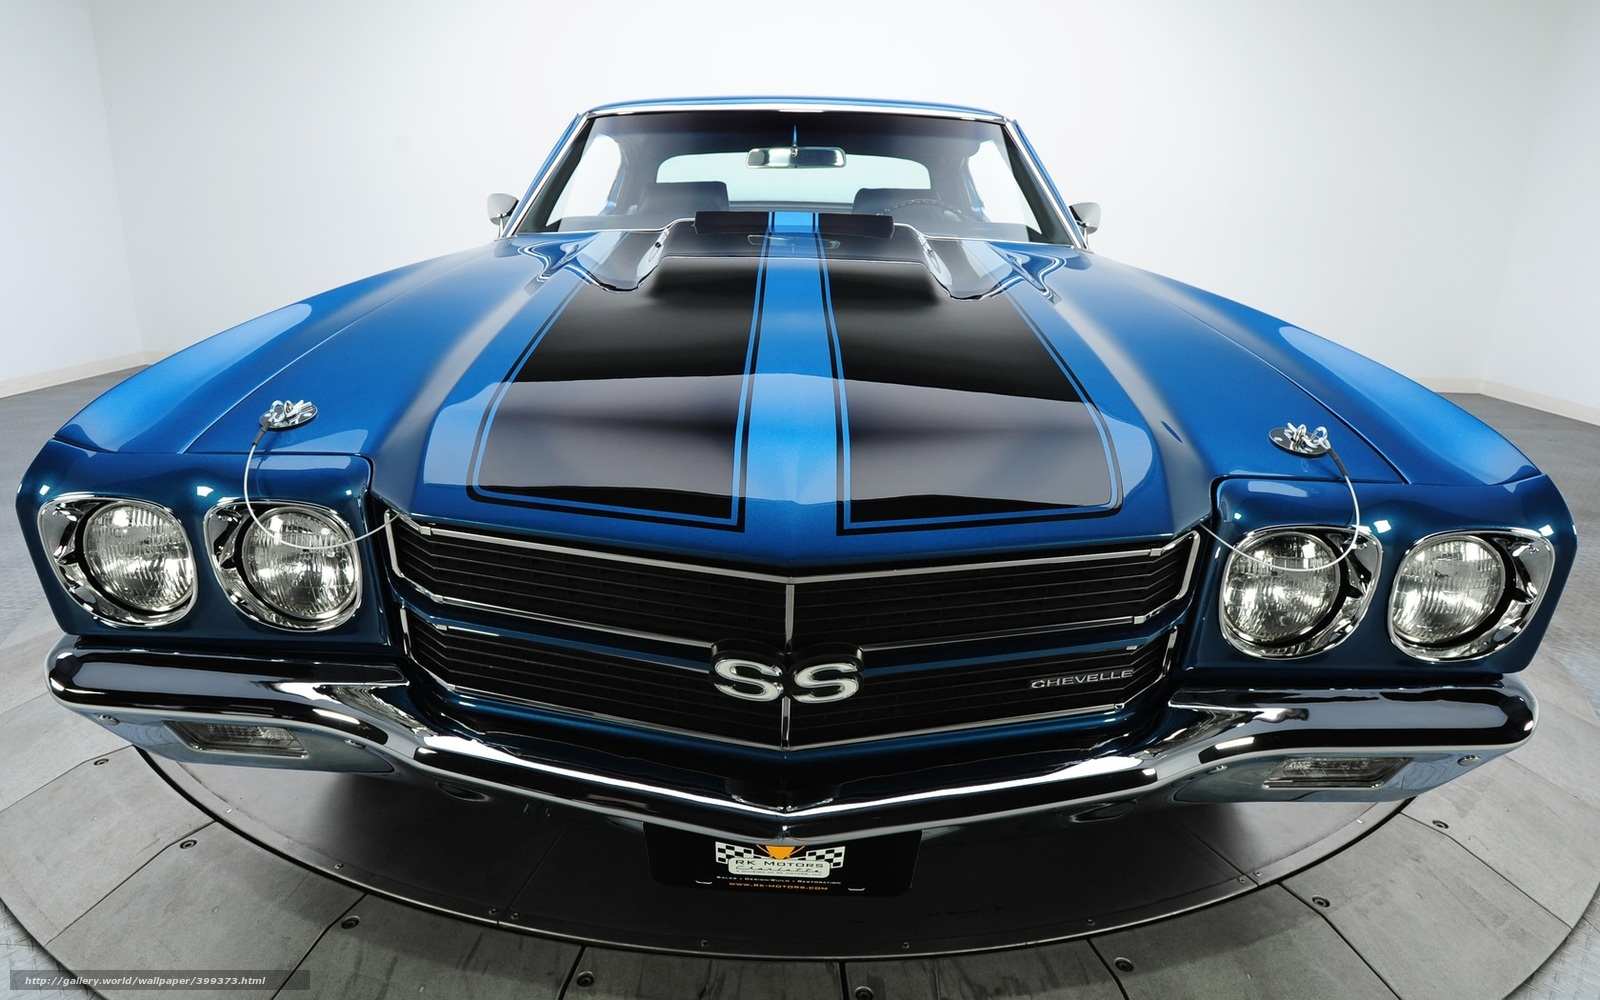 Download wallpaper Chevrolet shevil muscle car Chevrolet 1600x1000